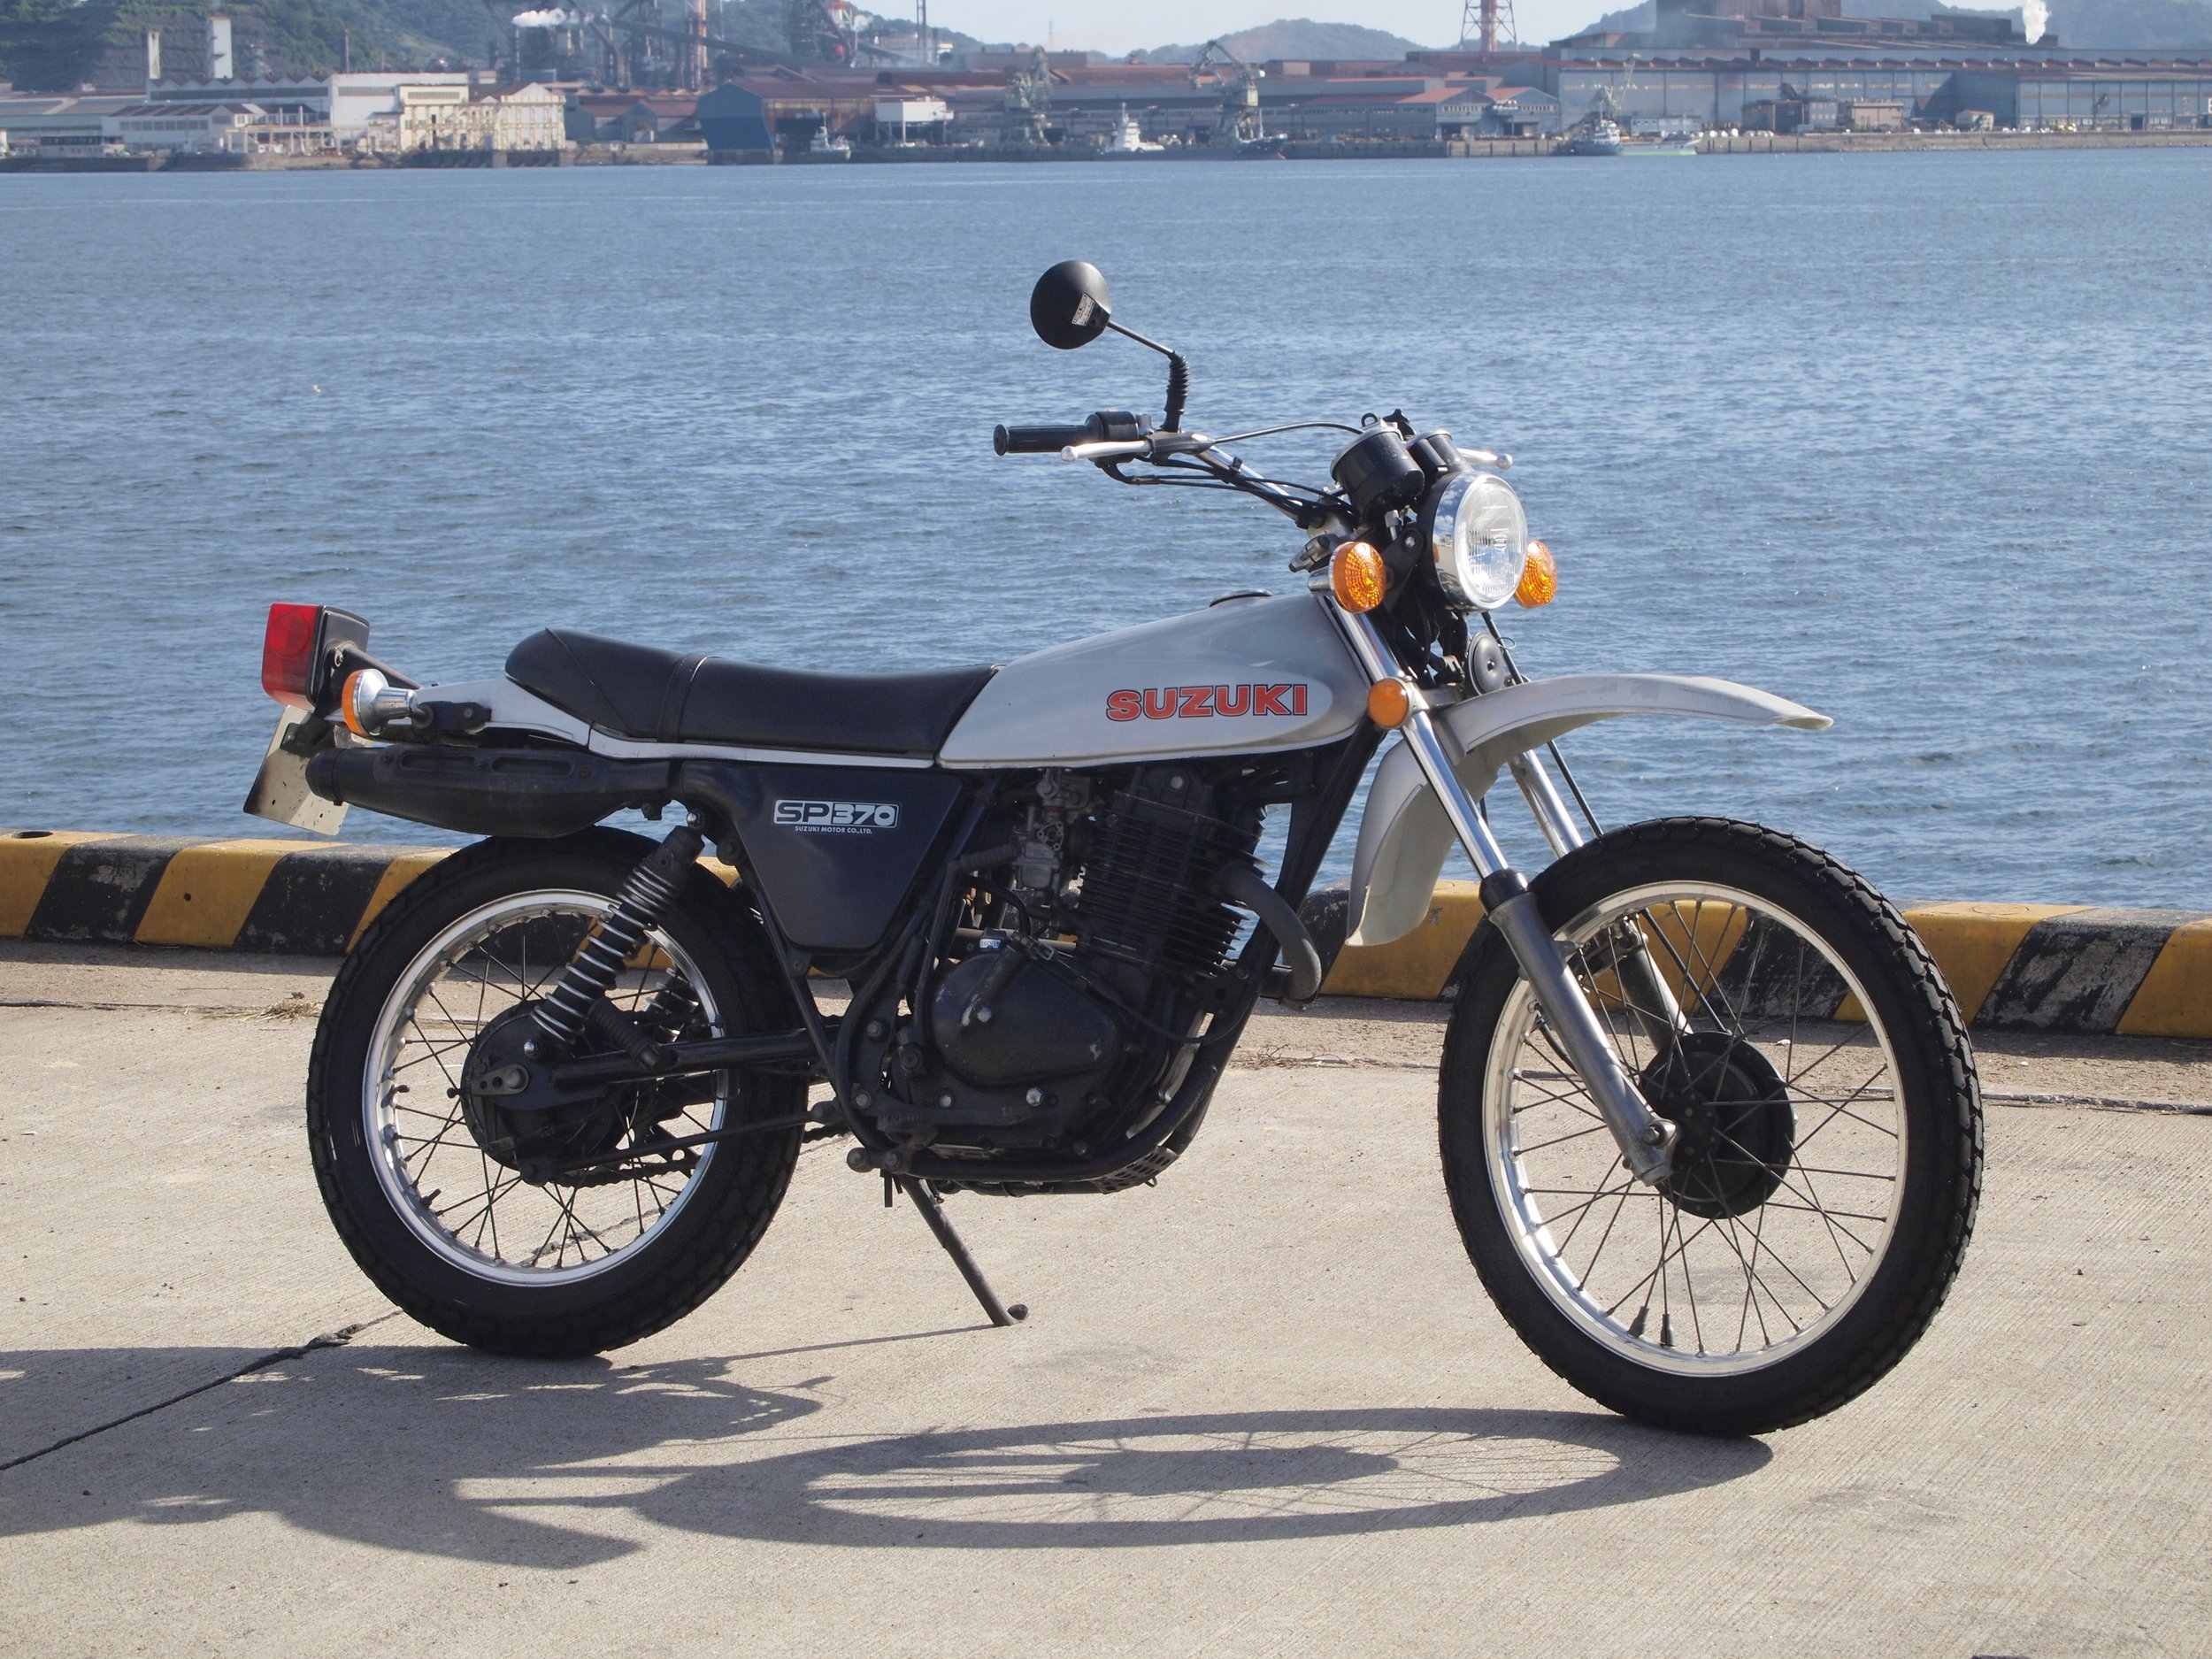 1978 SUZUKI SP370 — RePLAY MOTO SERVICE